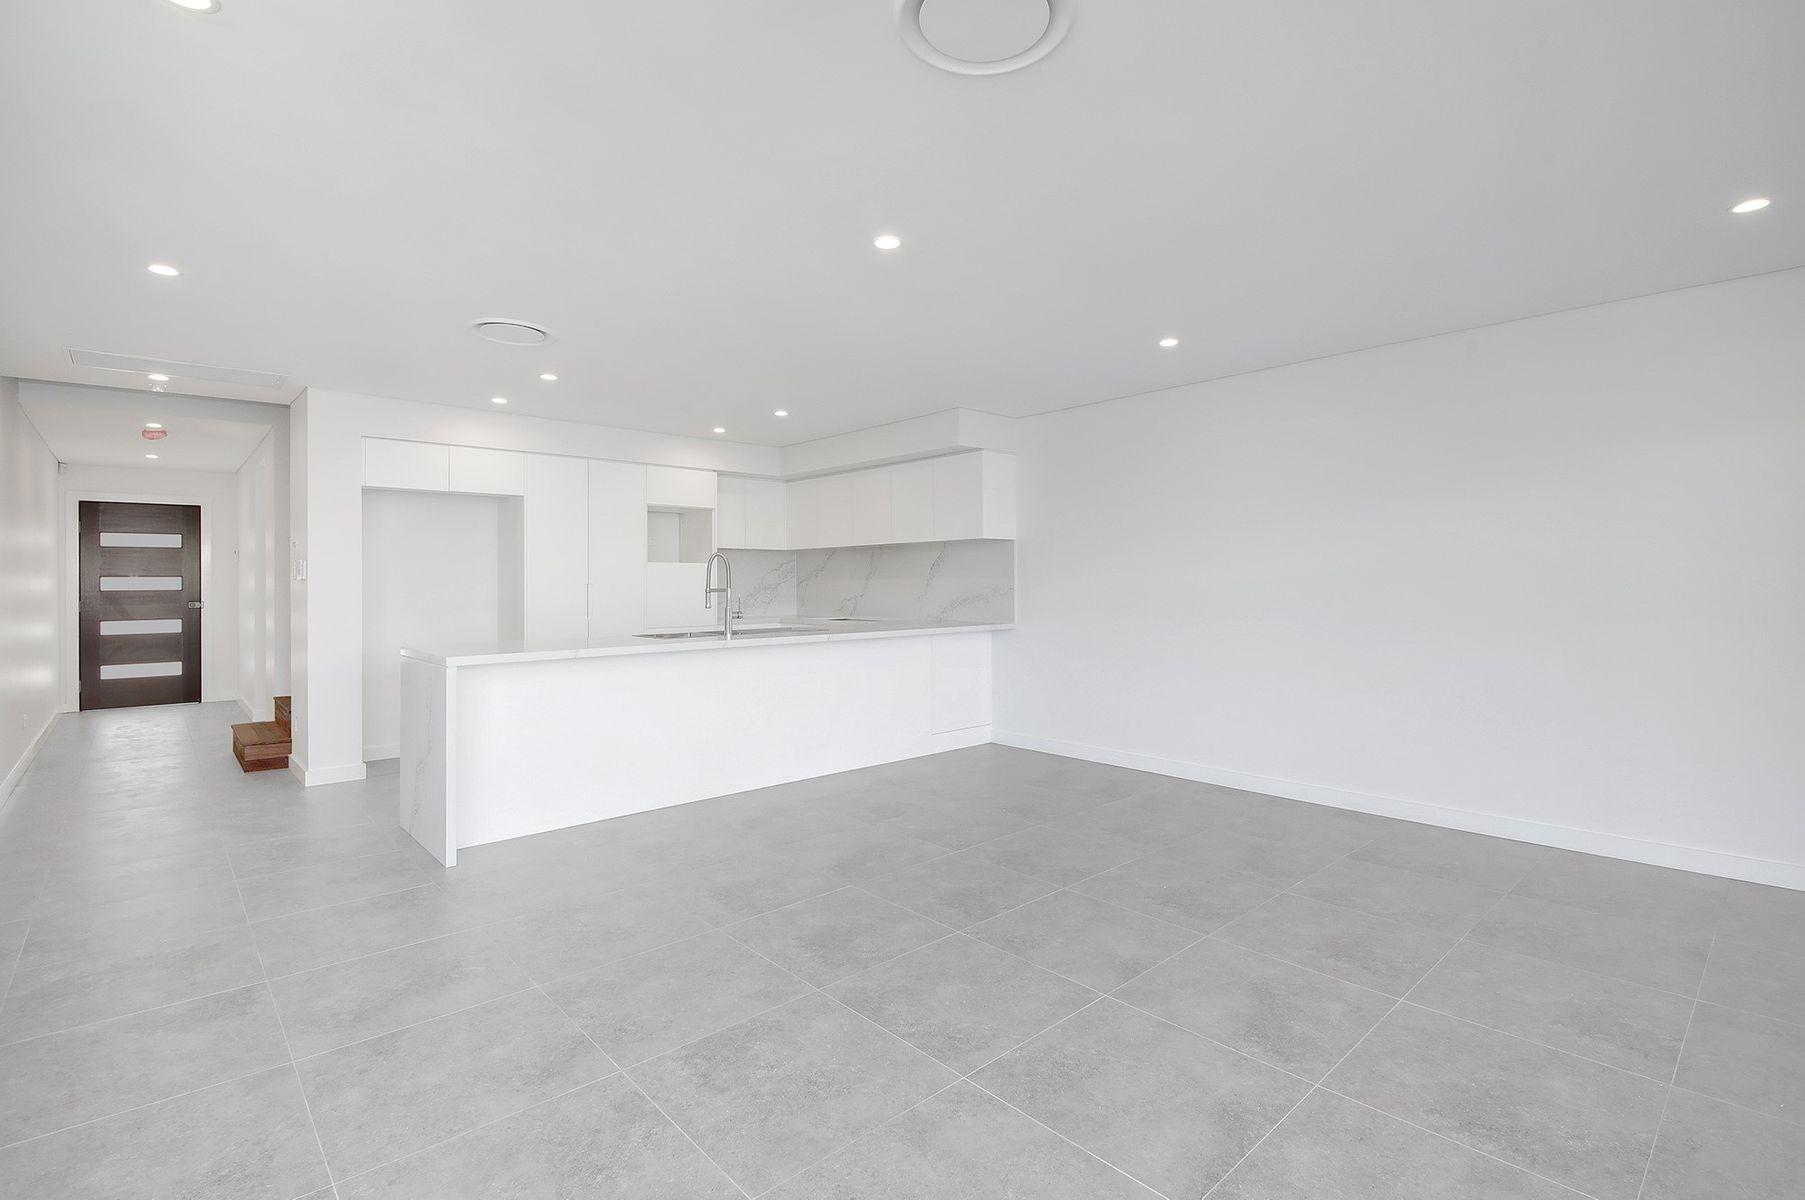 11/32 Ellis St, Condell Park, NSW 2200